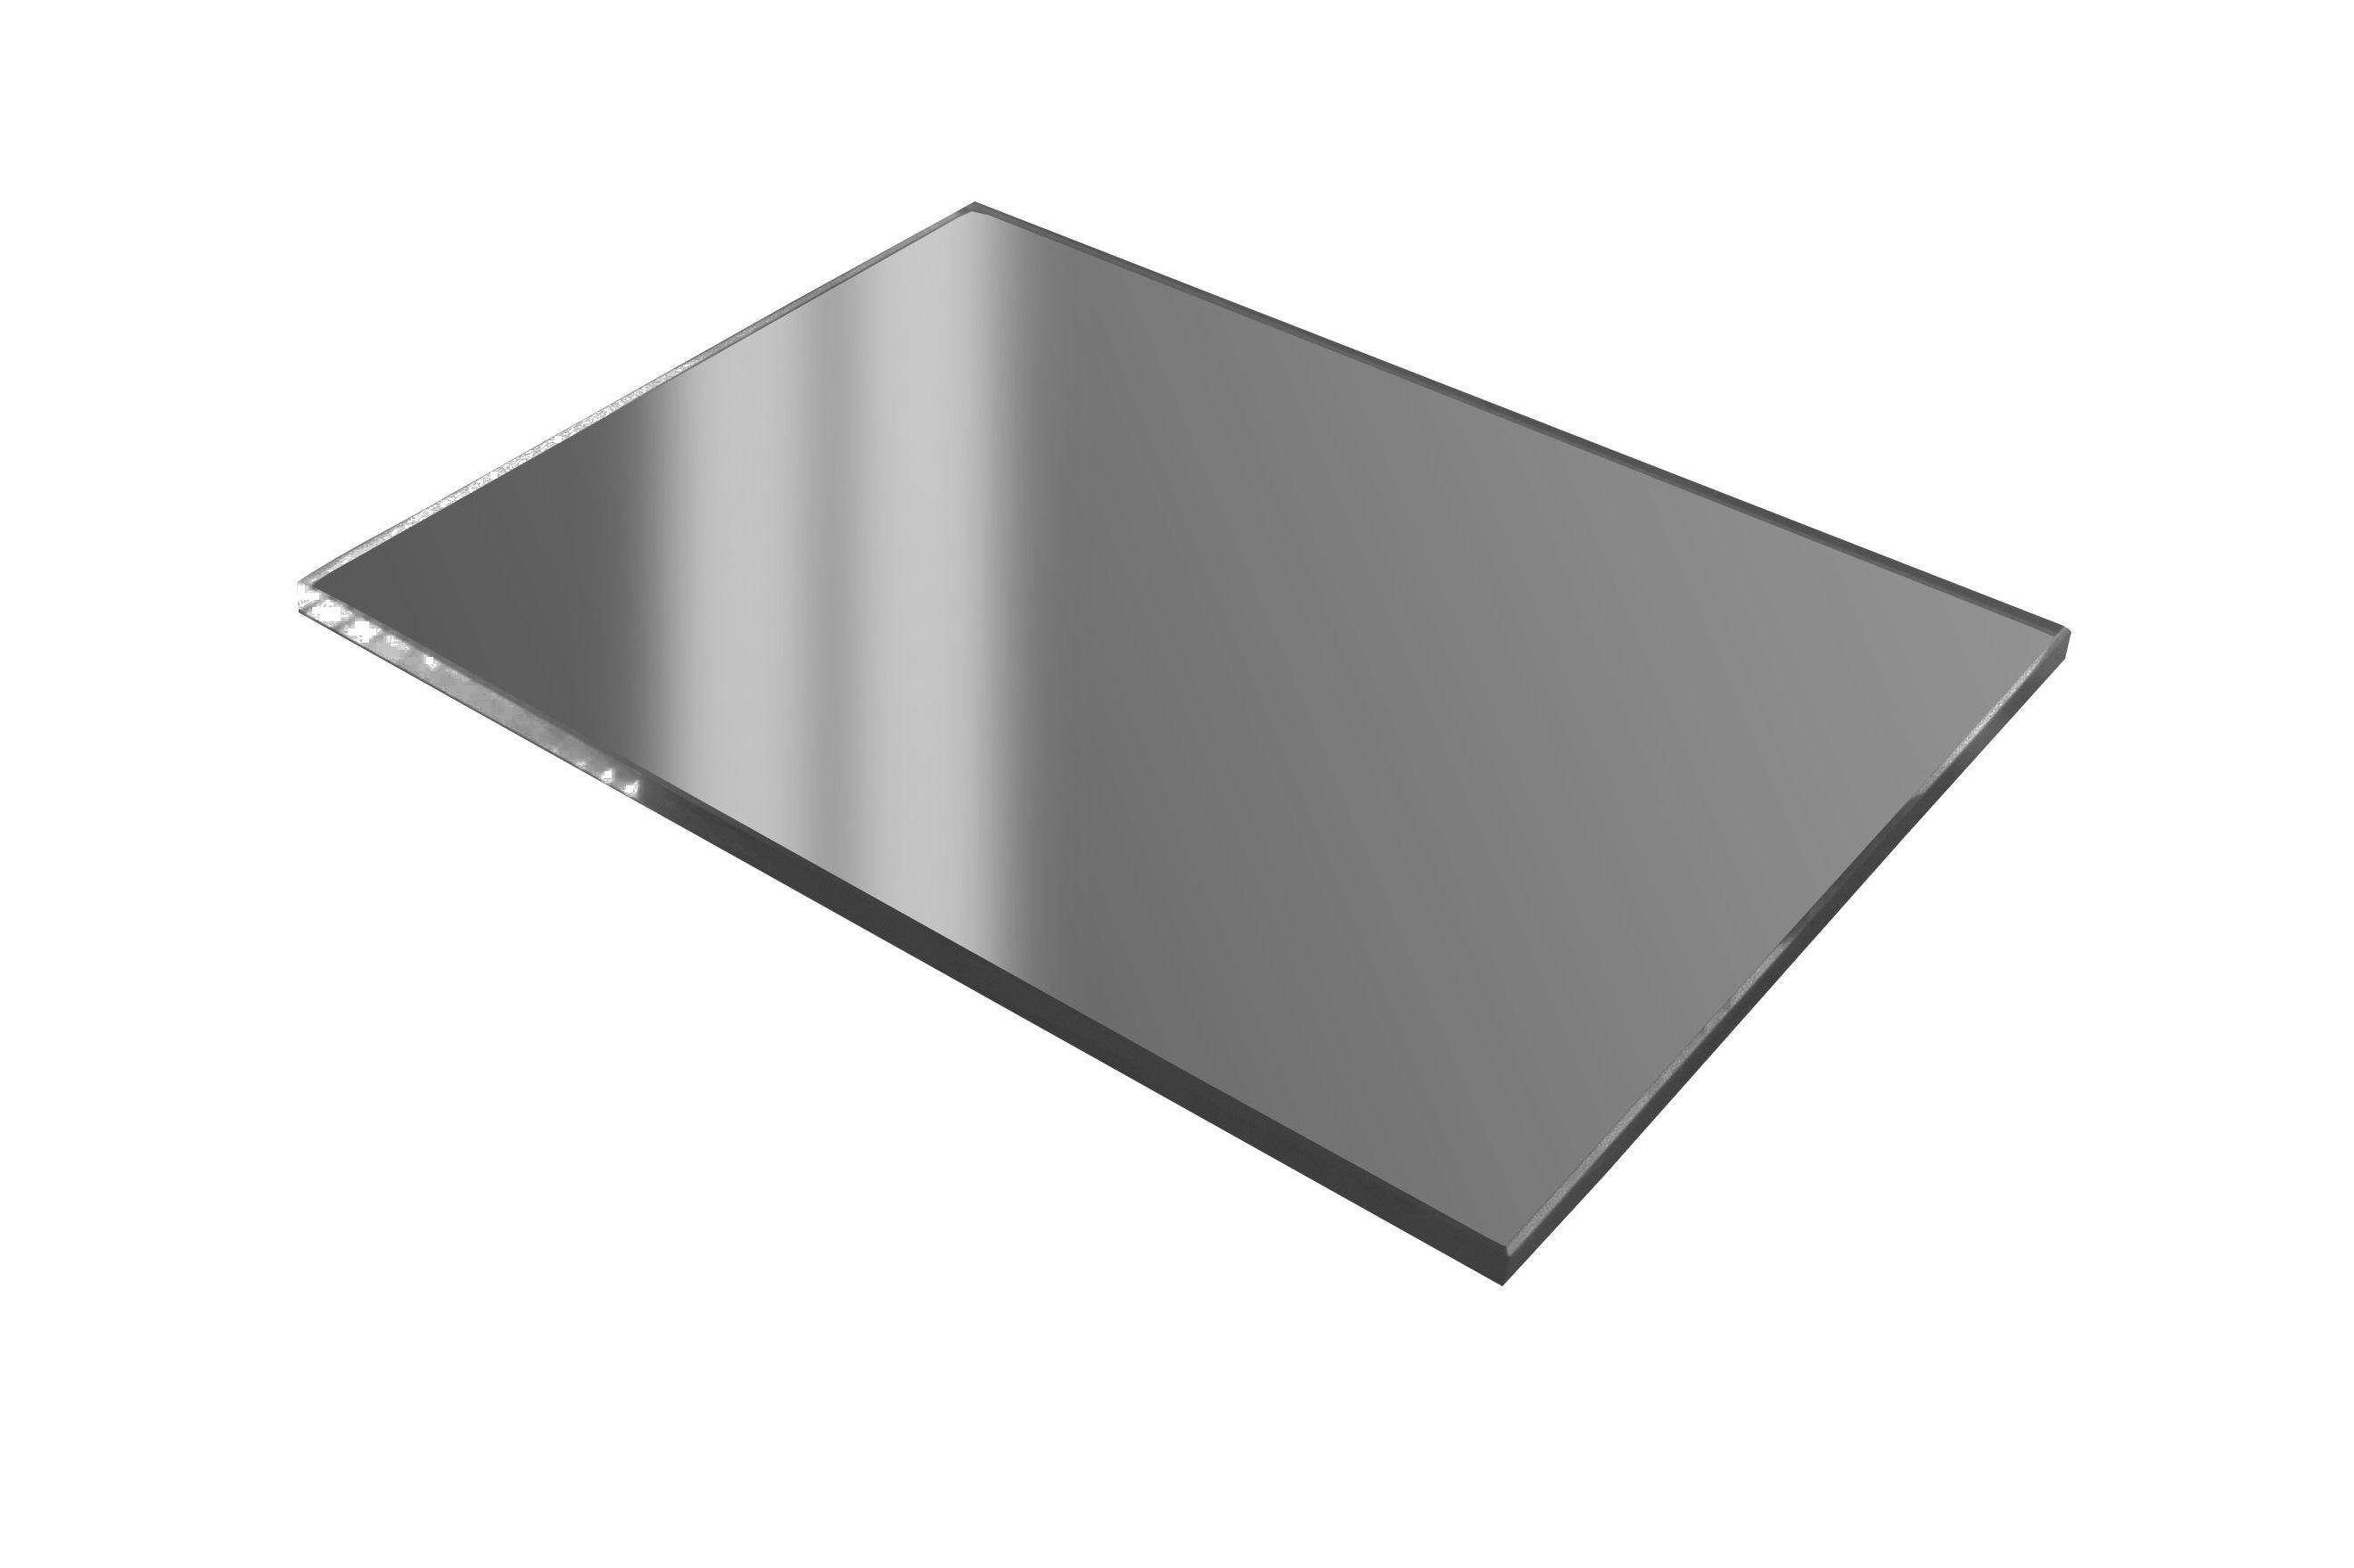 Tvrzené tmavé sklo GN 1/3 - Verlo